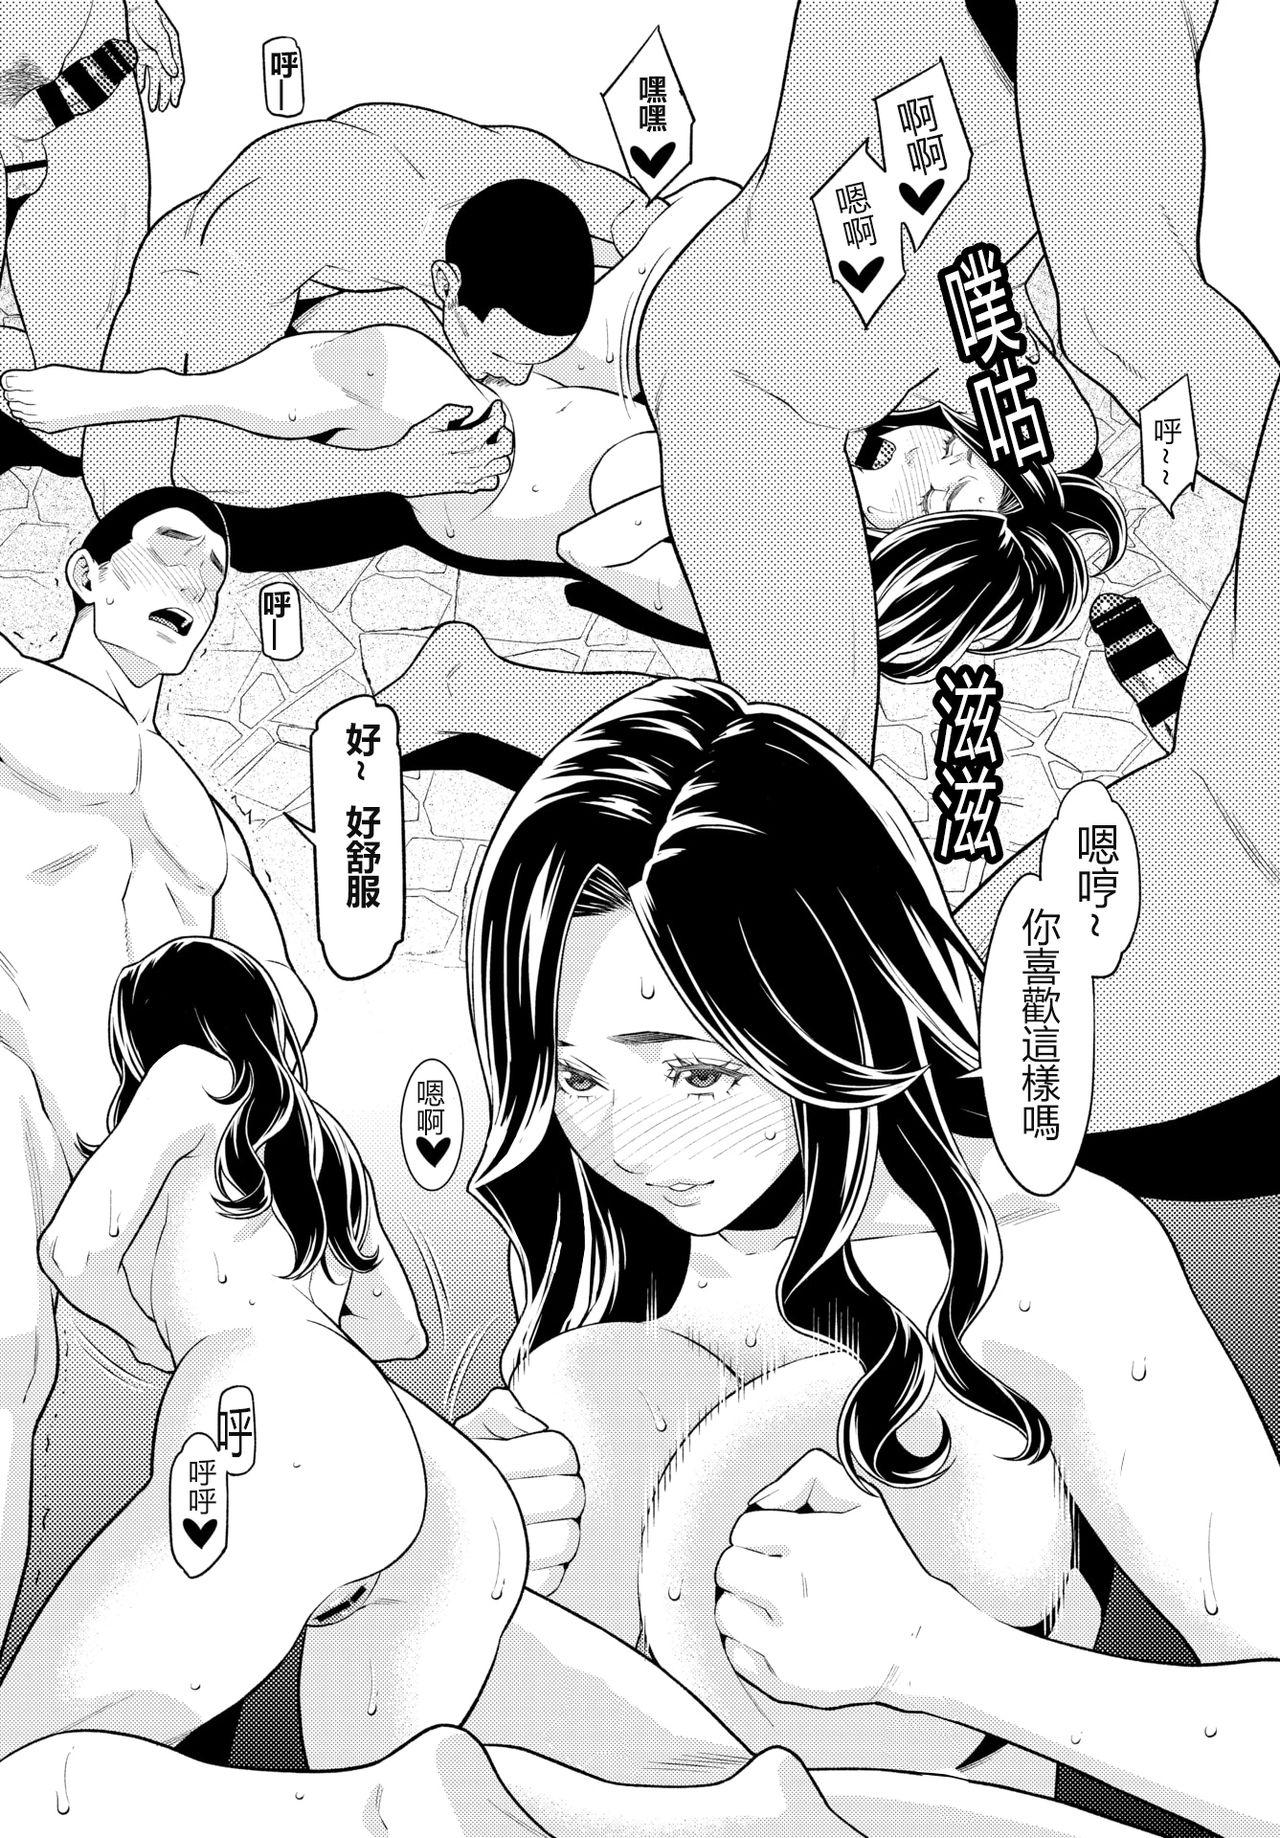 [Syuuen] Secret Wife  1-6 [Chinese][鼠灣漢化](210206最新修复完整版)【極品人妻NTR】 104